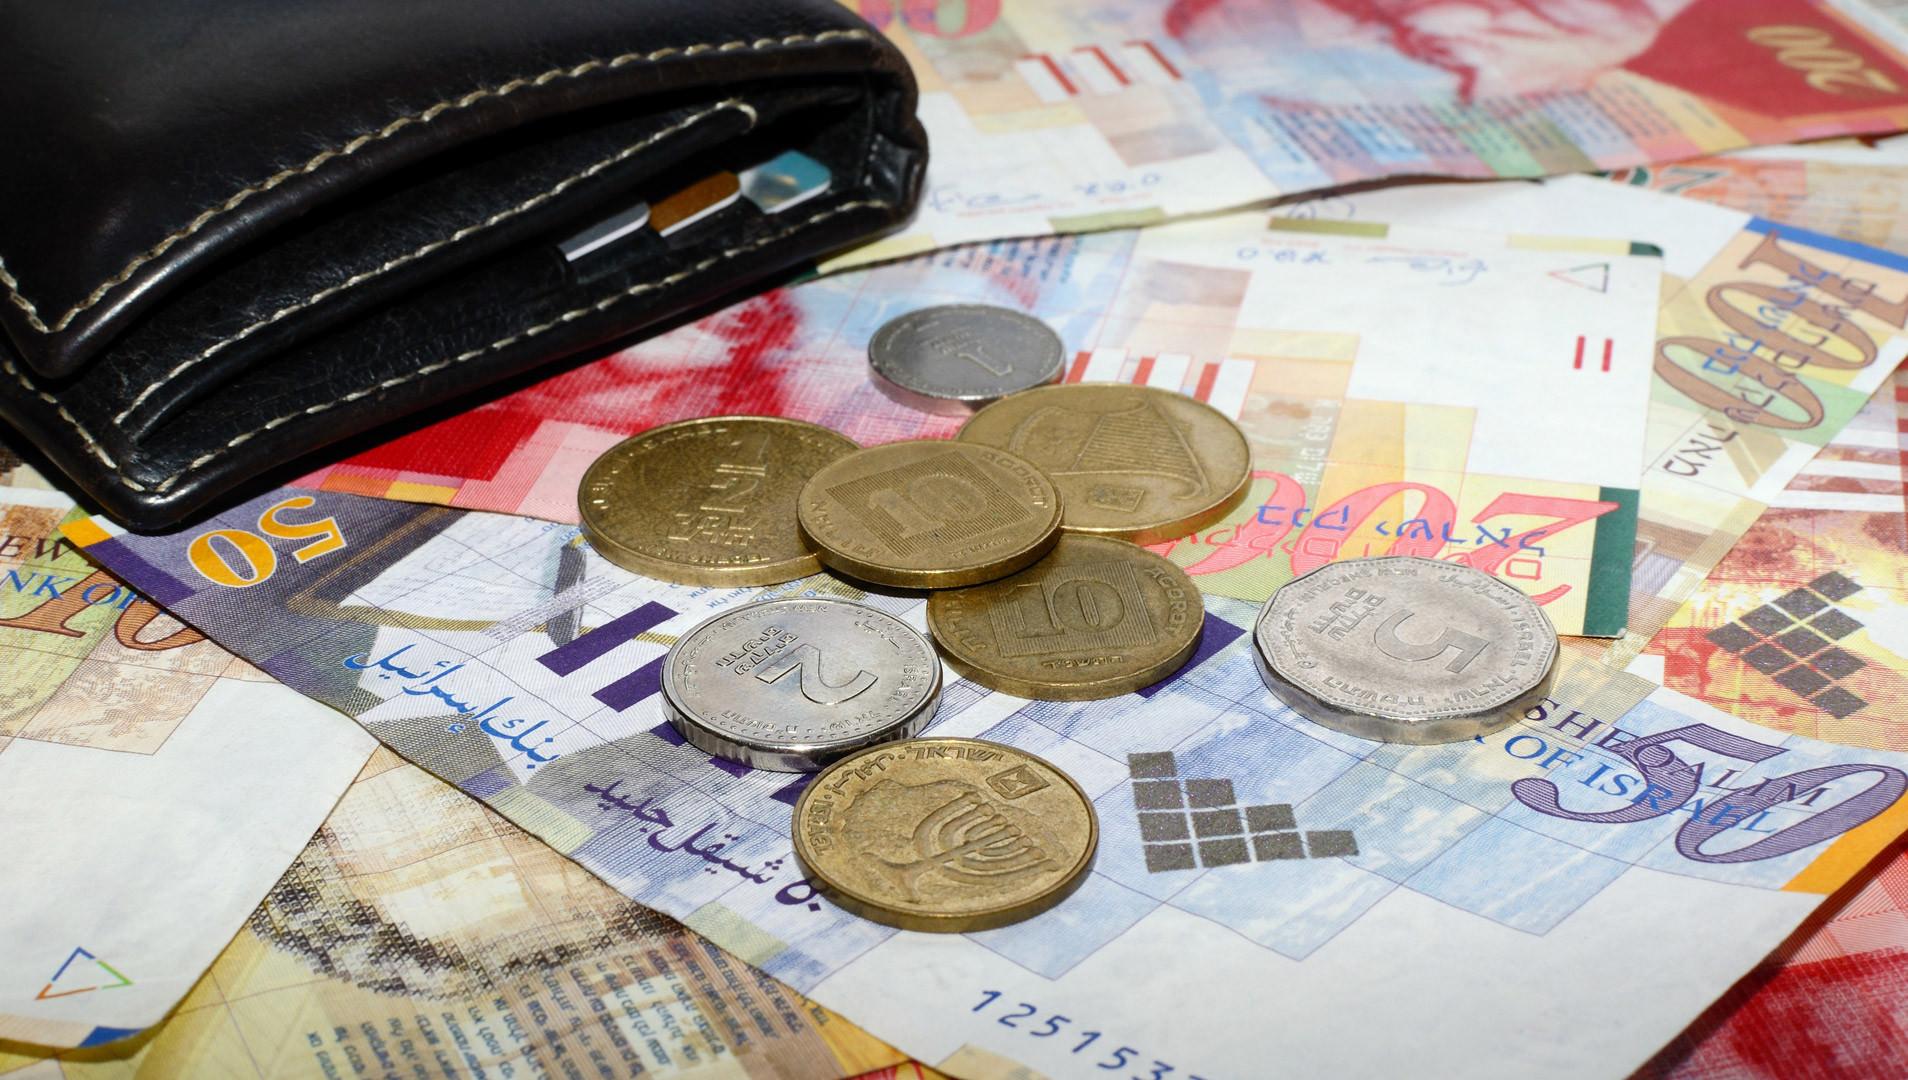 Banks in Israel: Opening a Bank Account | Nefesh B'Nefesh